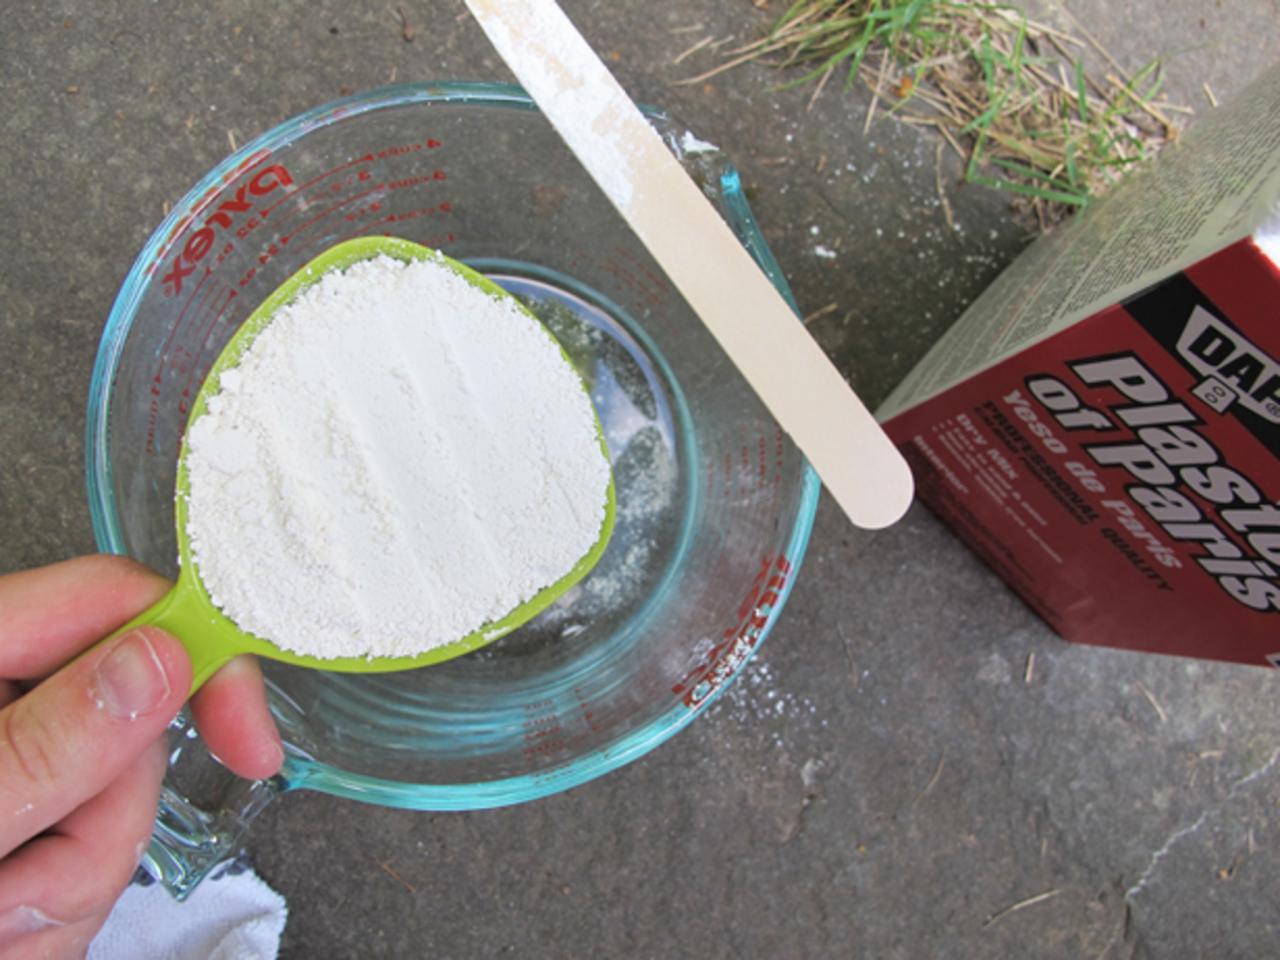 A Chalk Paint Experiment: Annie Sloan Vs. HomeMade